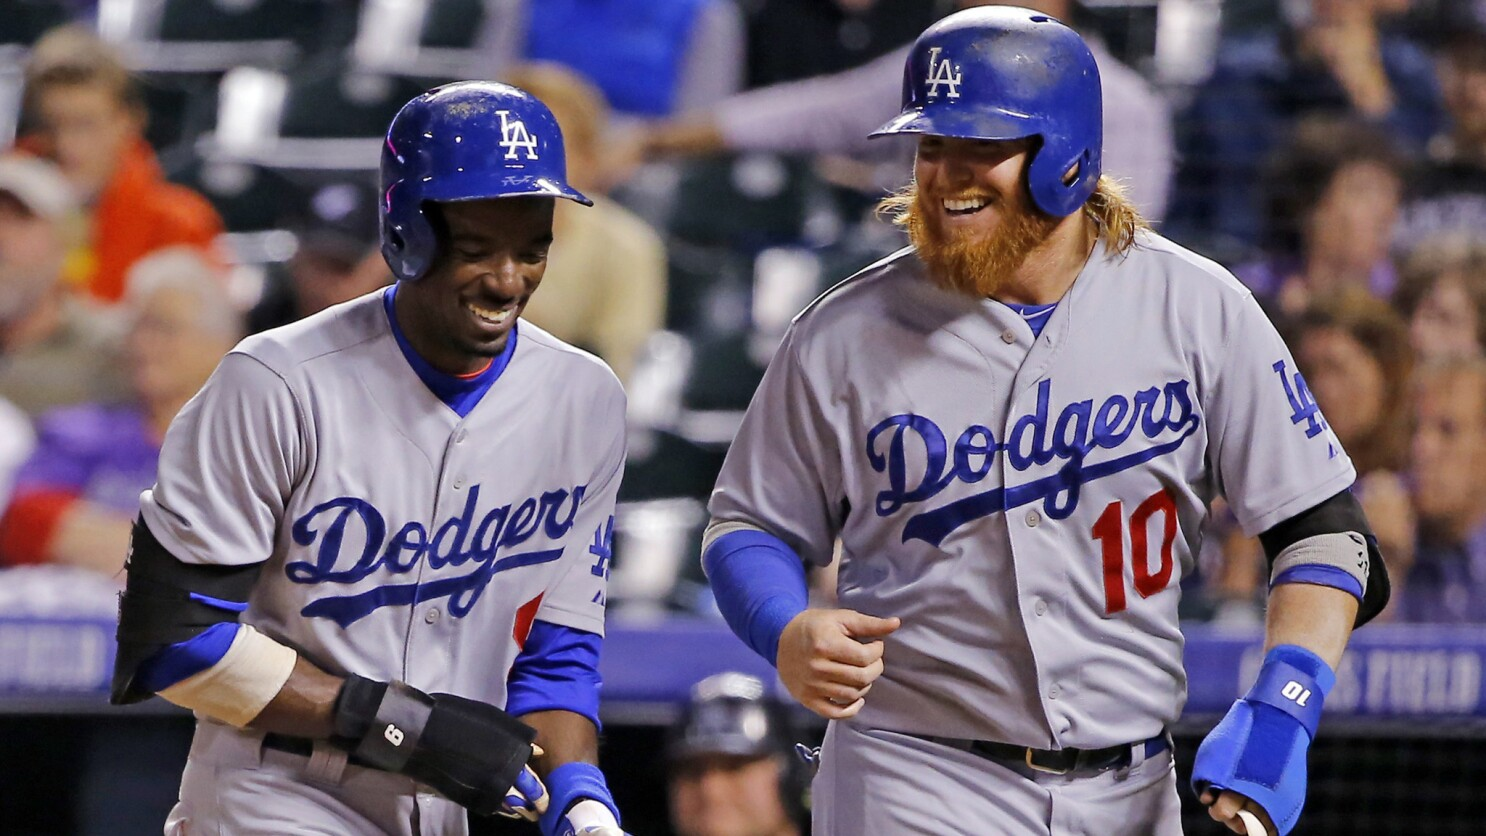 Dodgers' Dee Gordon, Justin Turner are living the postseason dream